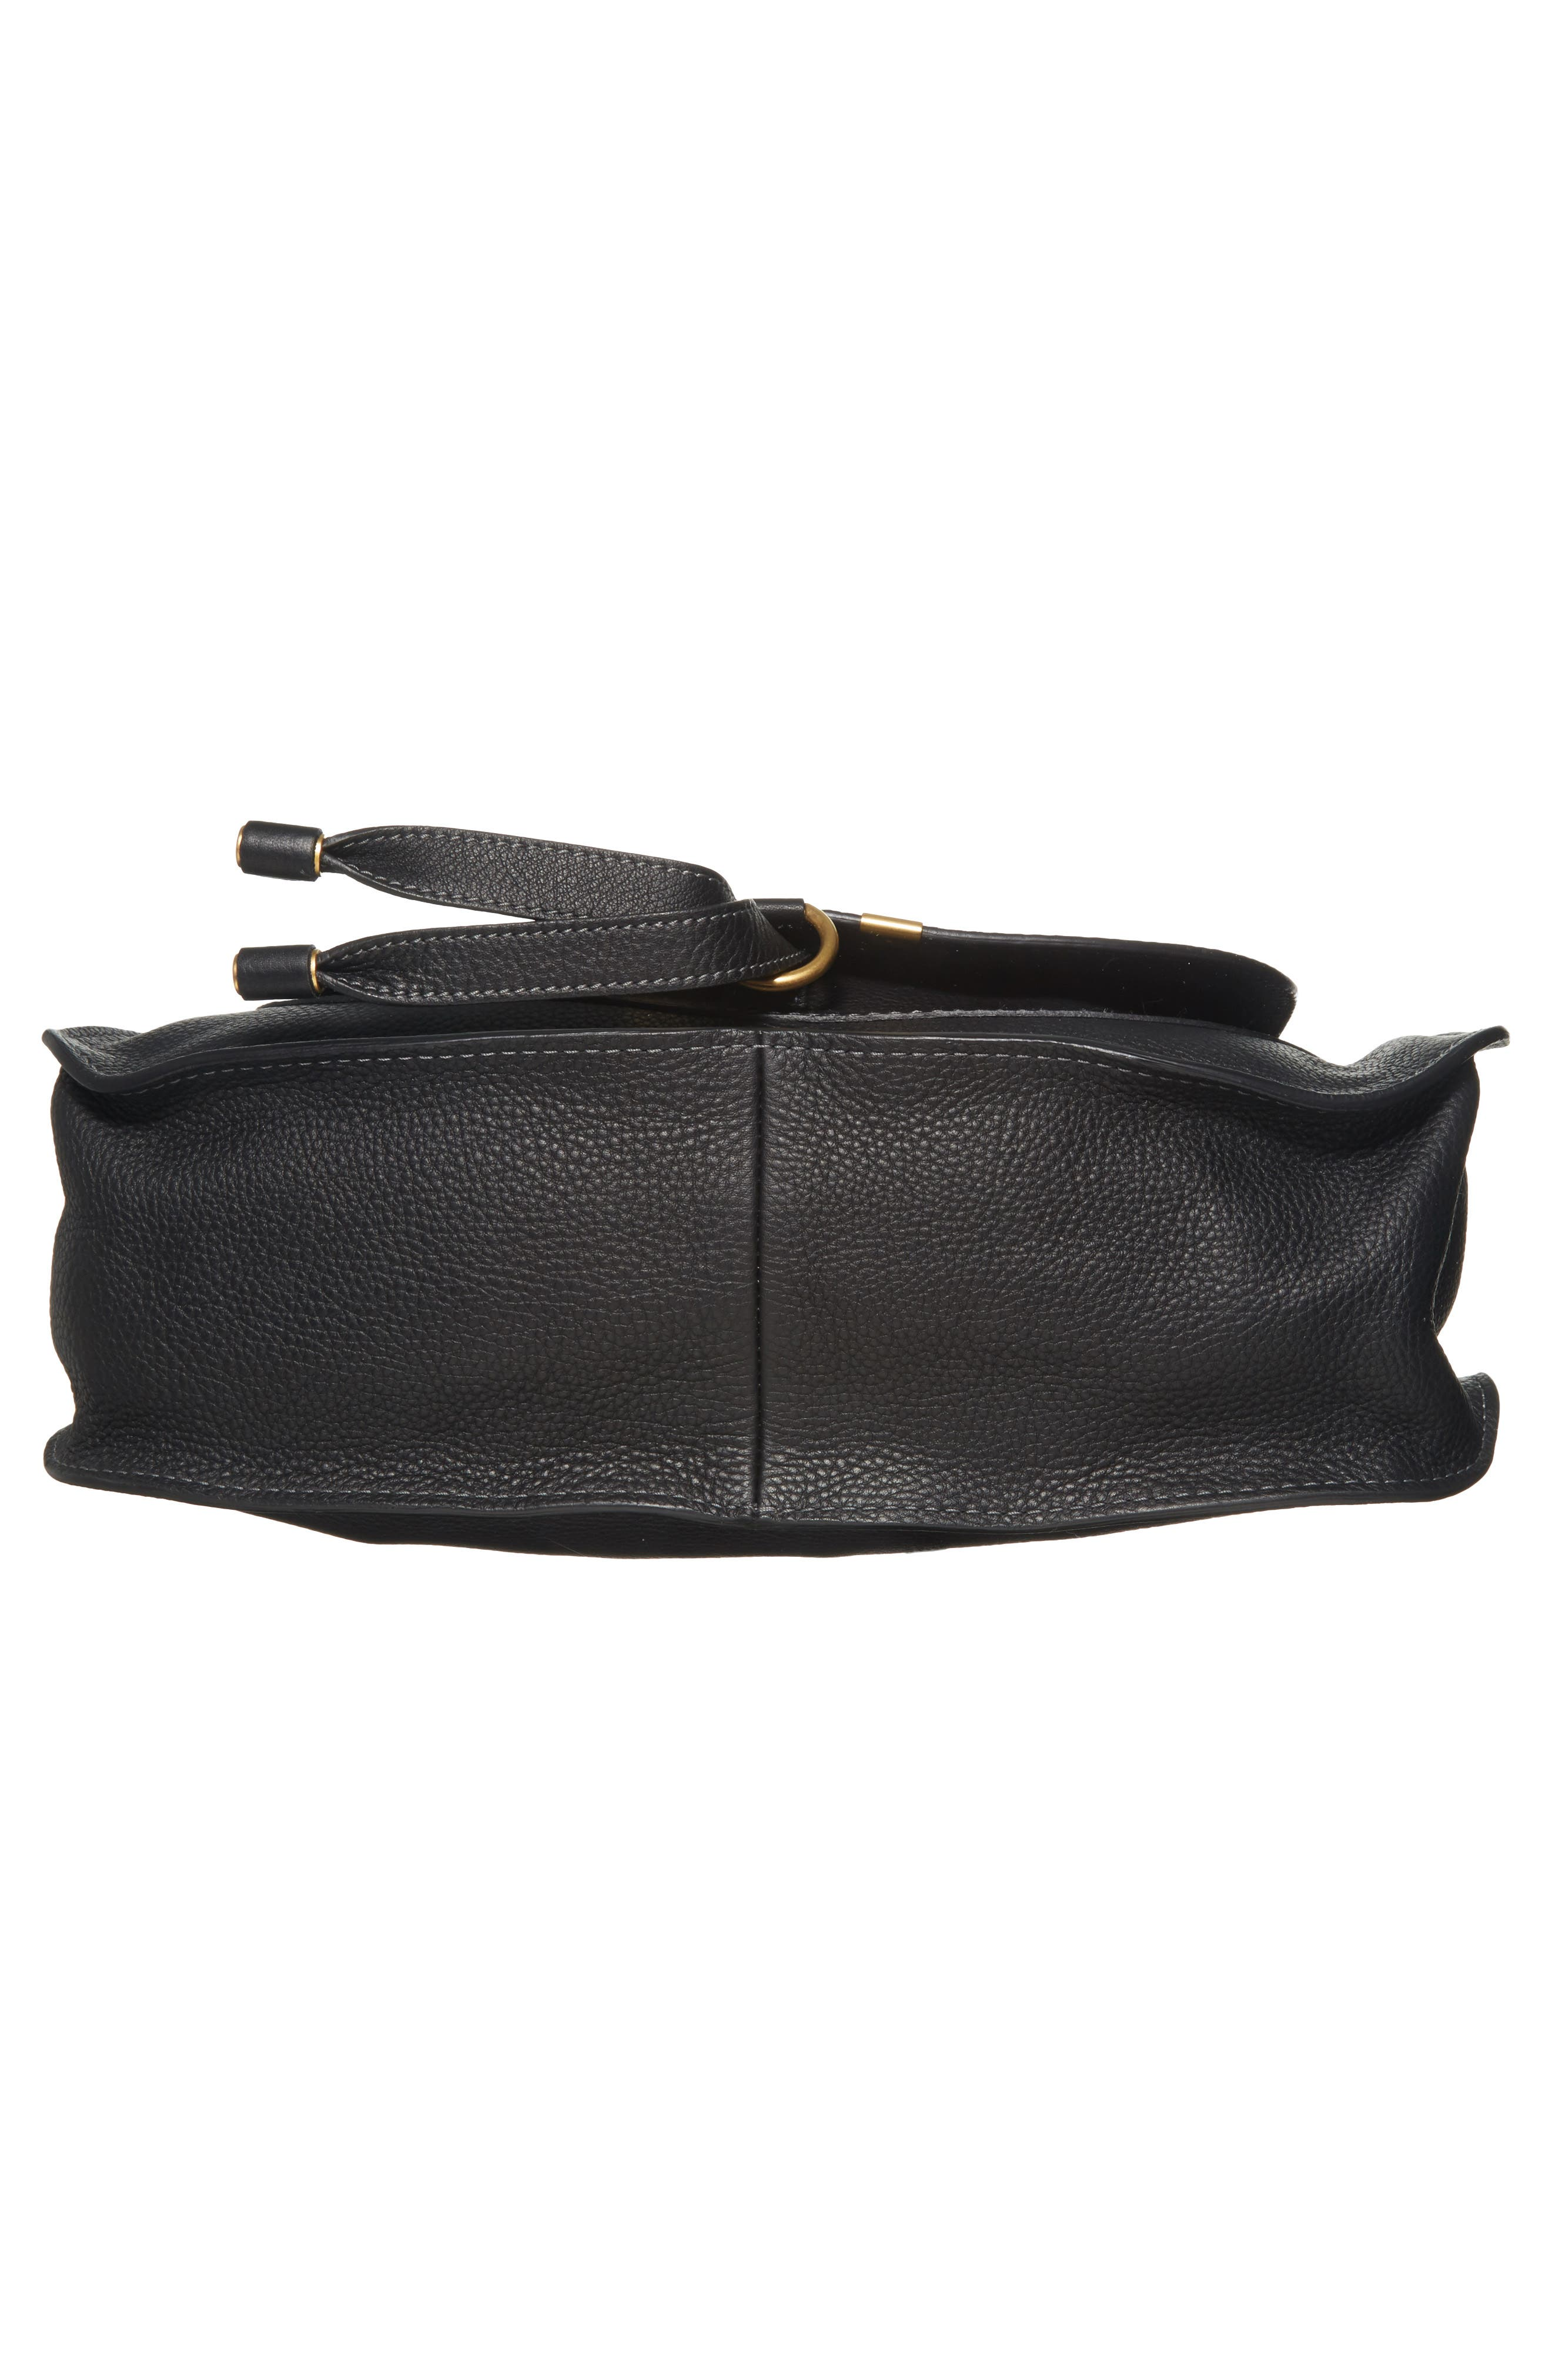 CHLOÉ, 'Medium Marcie' Leather Satchel, Alternate thumbnail 6, color, BLACK GOLD HRDWRE